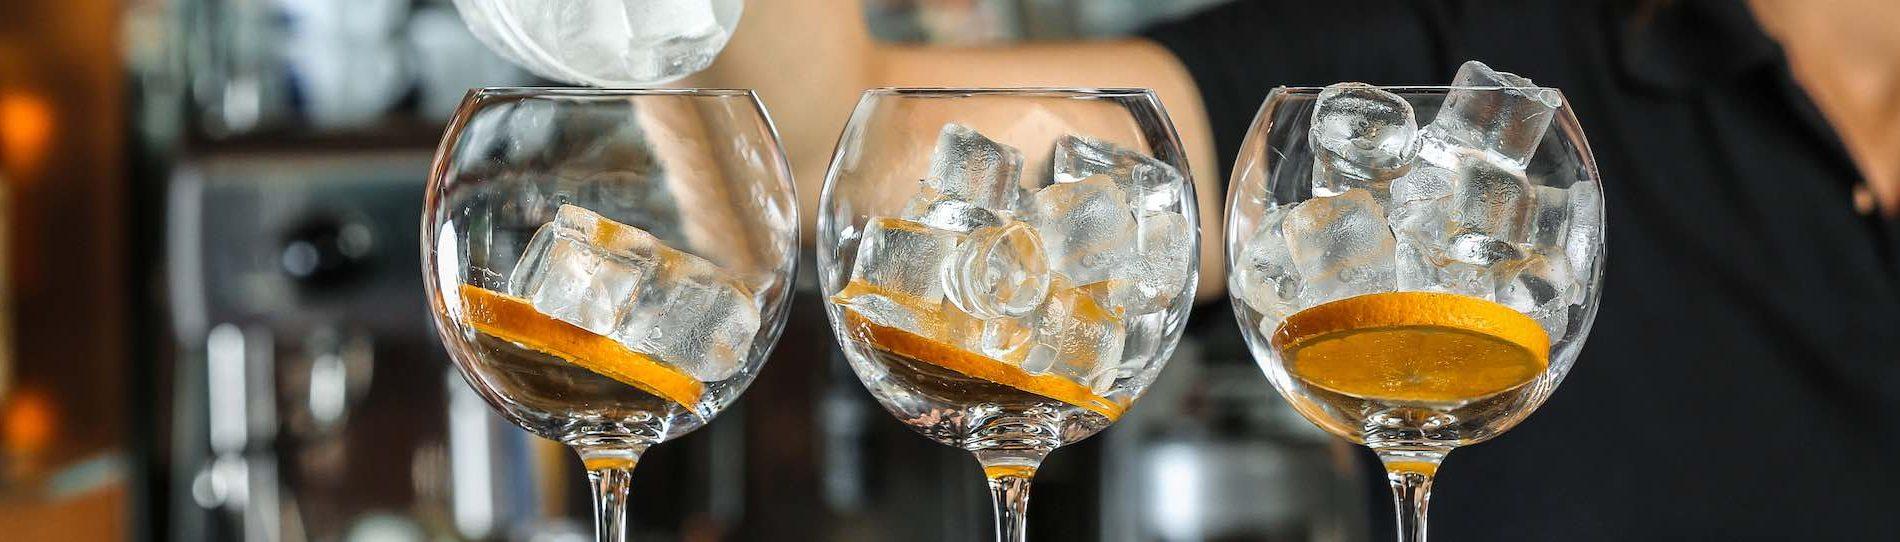 bartender making three drinks at bar